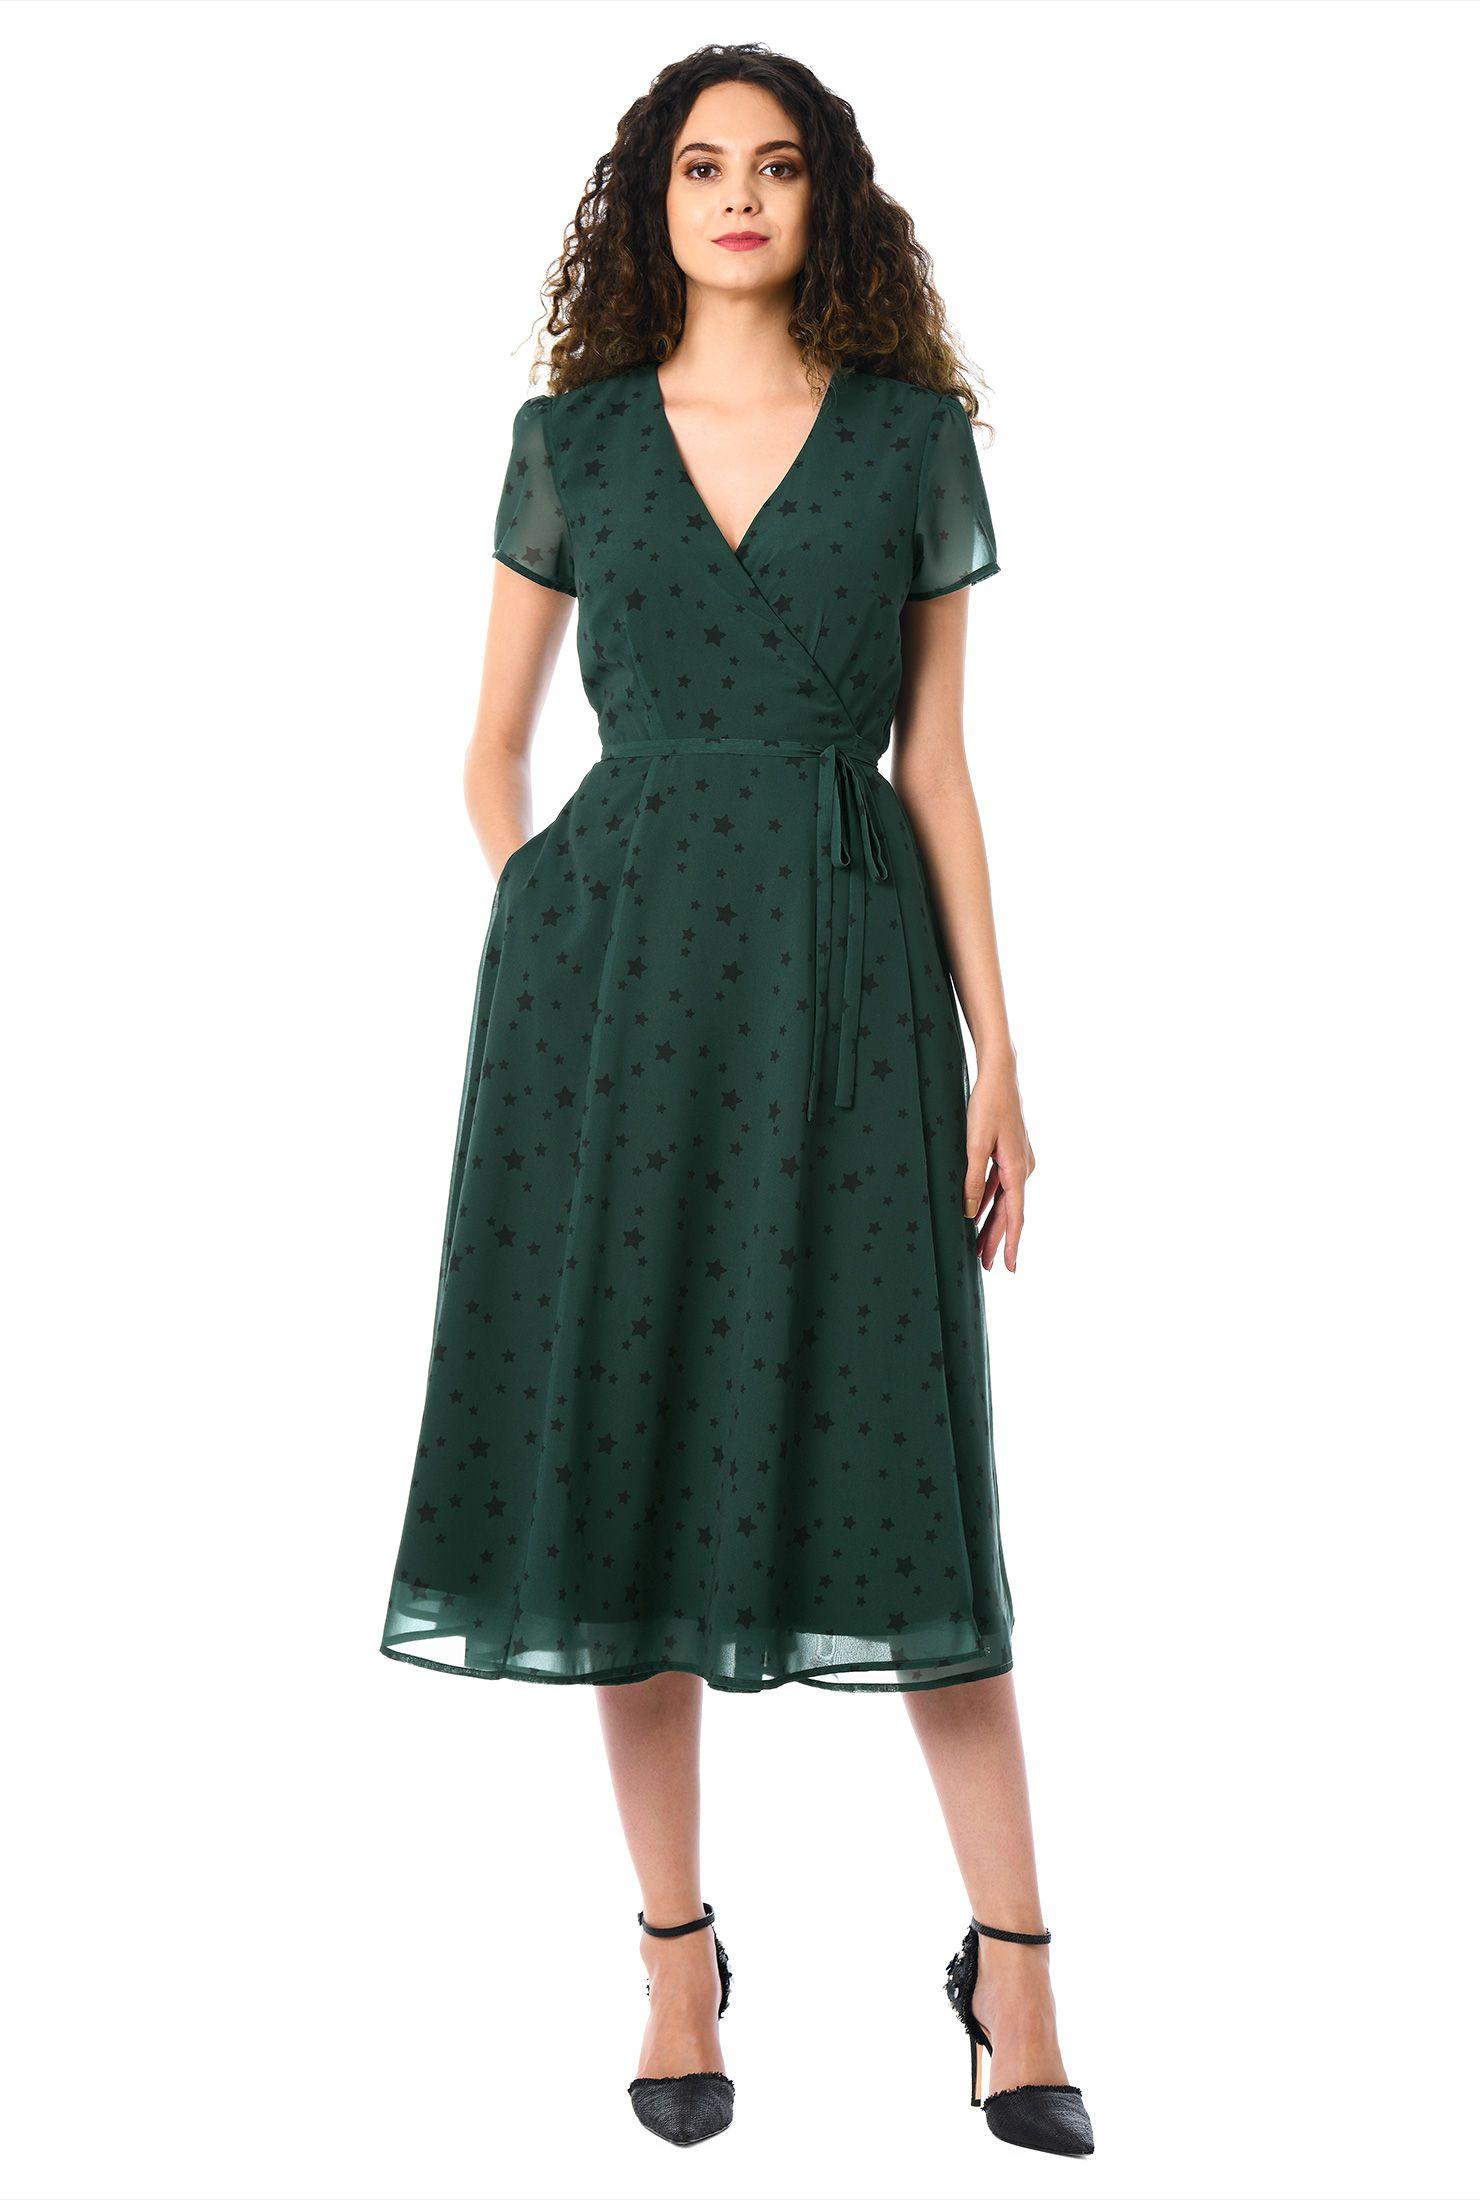 Spring Women Green Floral Printed V-Neck Dress Vintage Dress Bird Printed Midi Dress